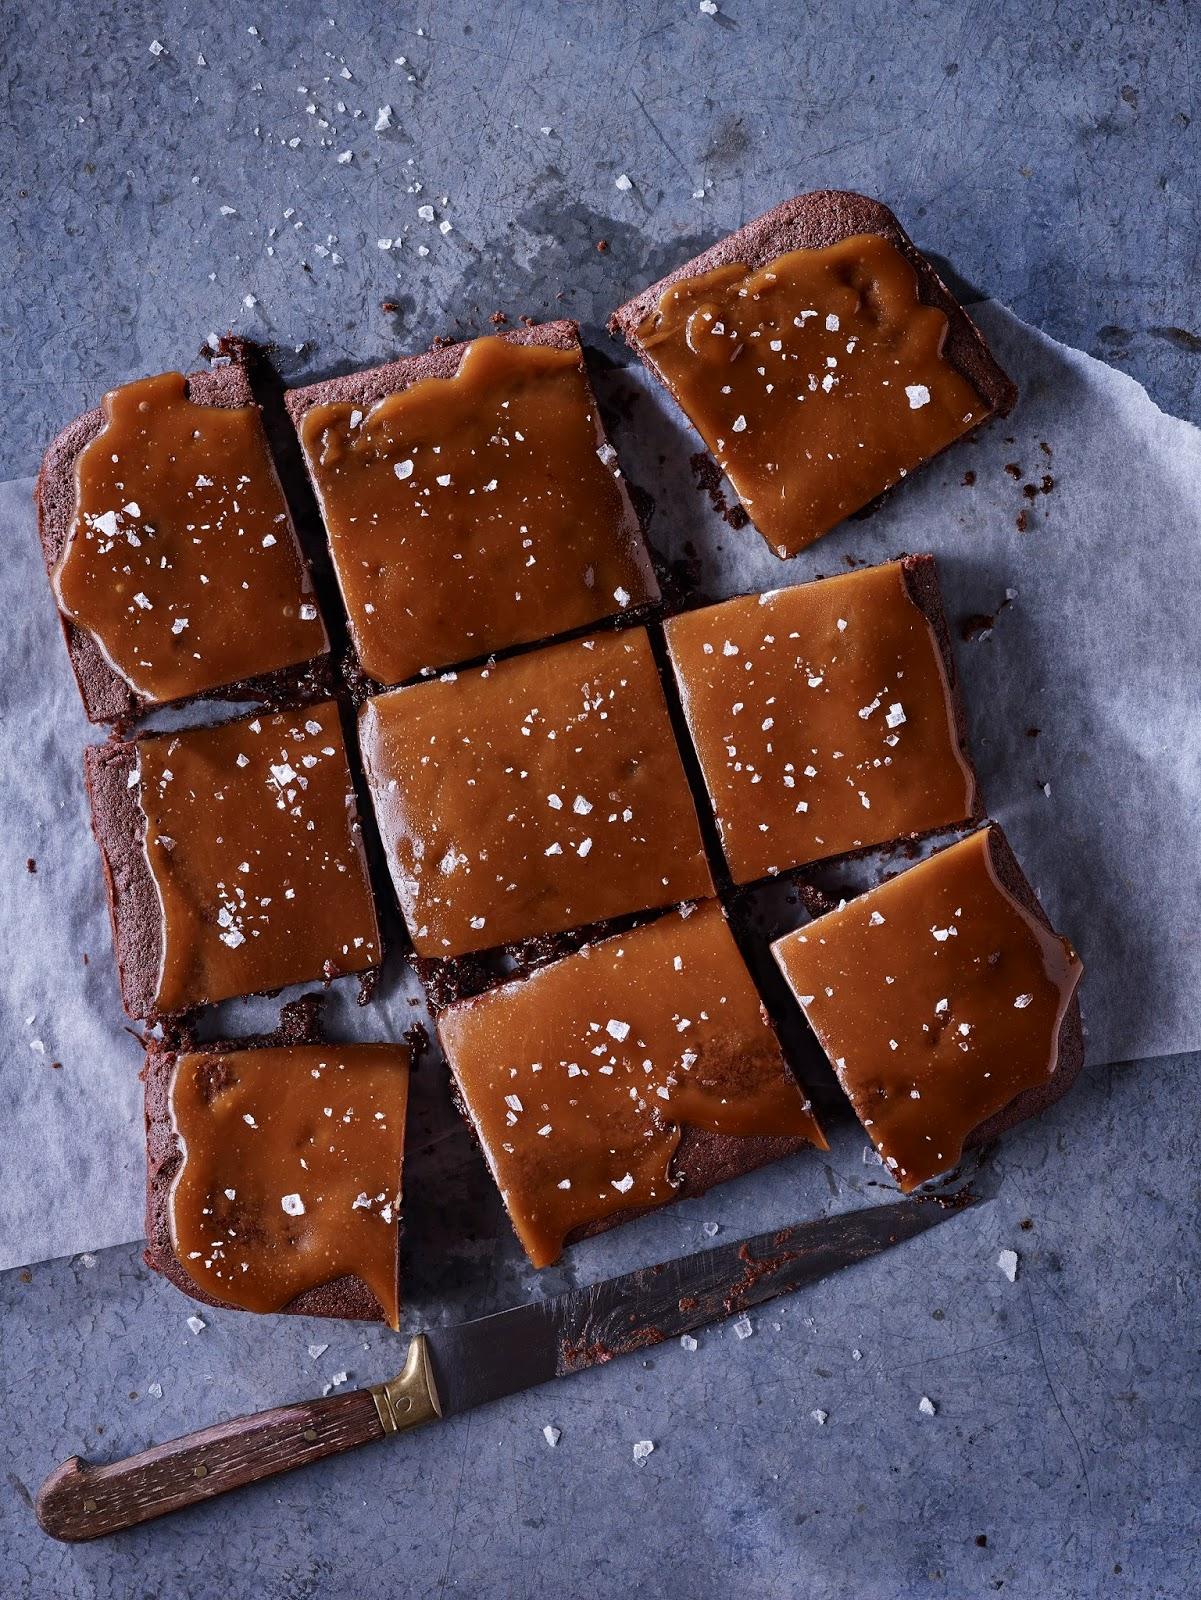 Gooey Sea Salted Caramel Brownies